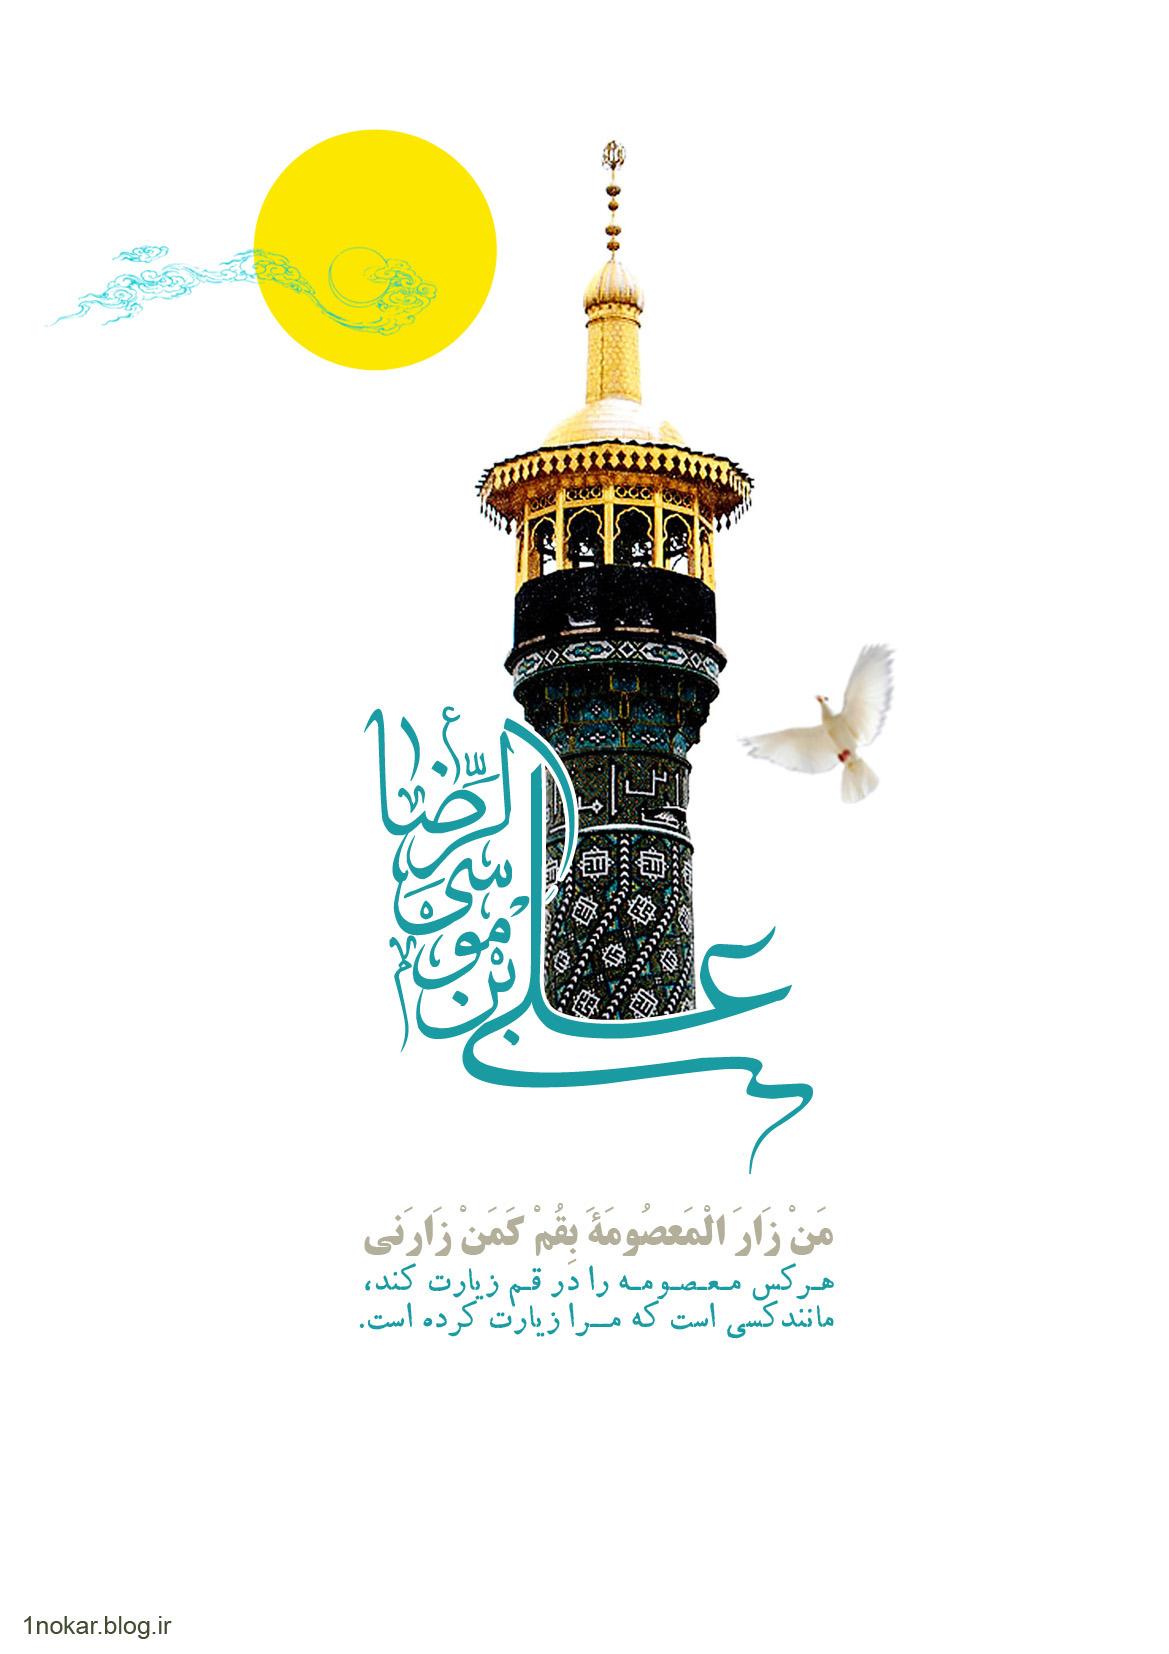 http://s2.picofile.com/file/7884443652/hadis_emam_reza.jpg